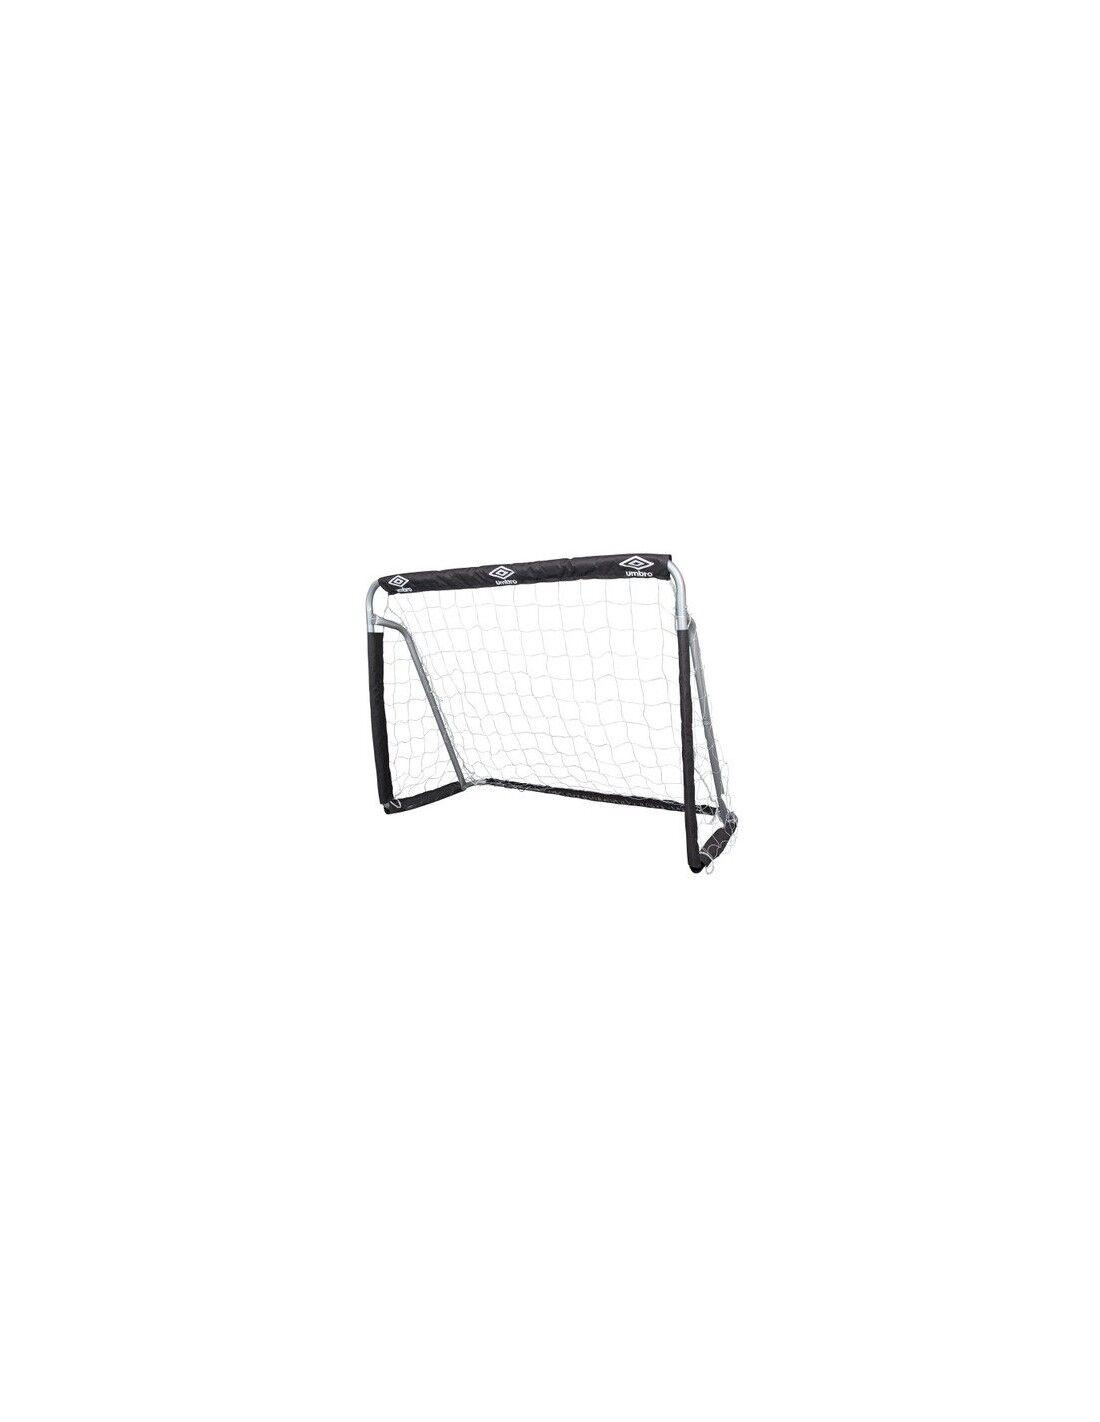 Umbro Fotballmål i Stål 150c110cm